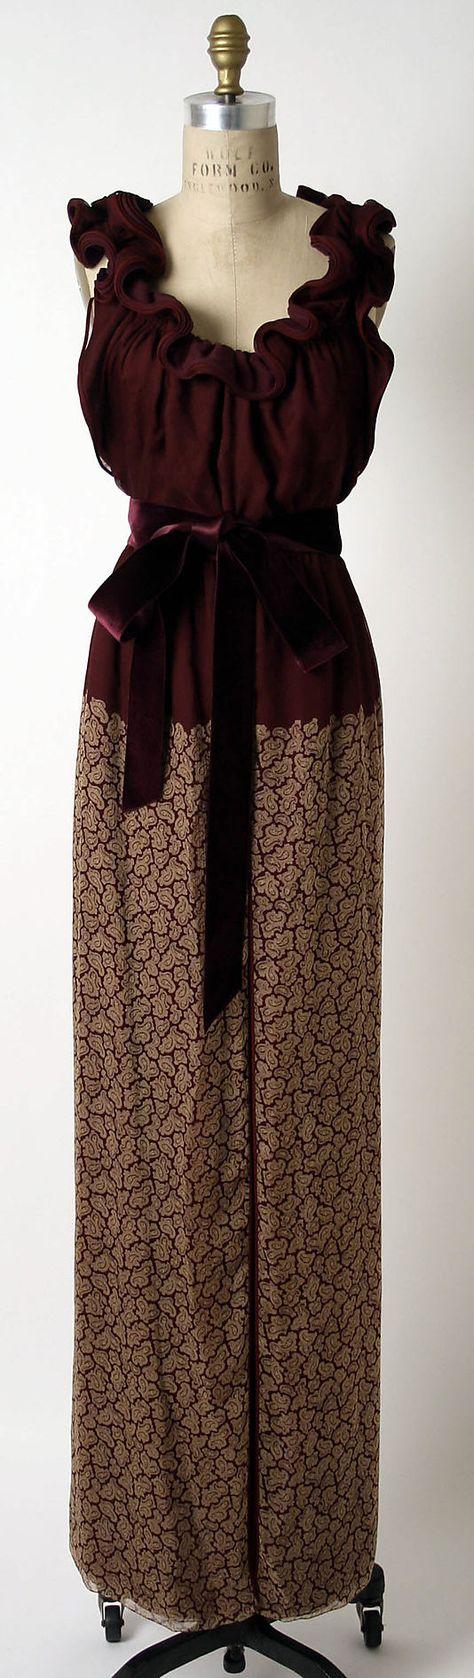 Galanos Dress - FW 1977-78 - by James Galanos (American, born 1924) - Silk